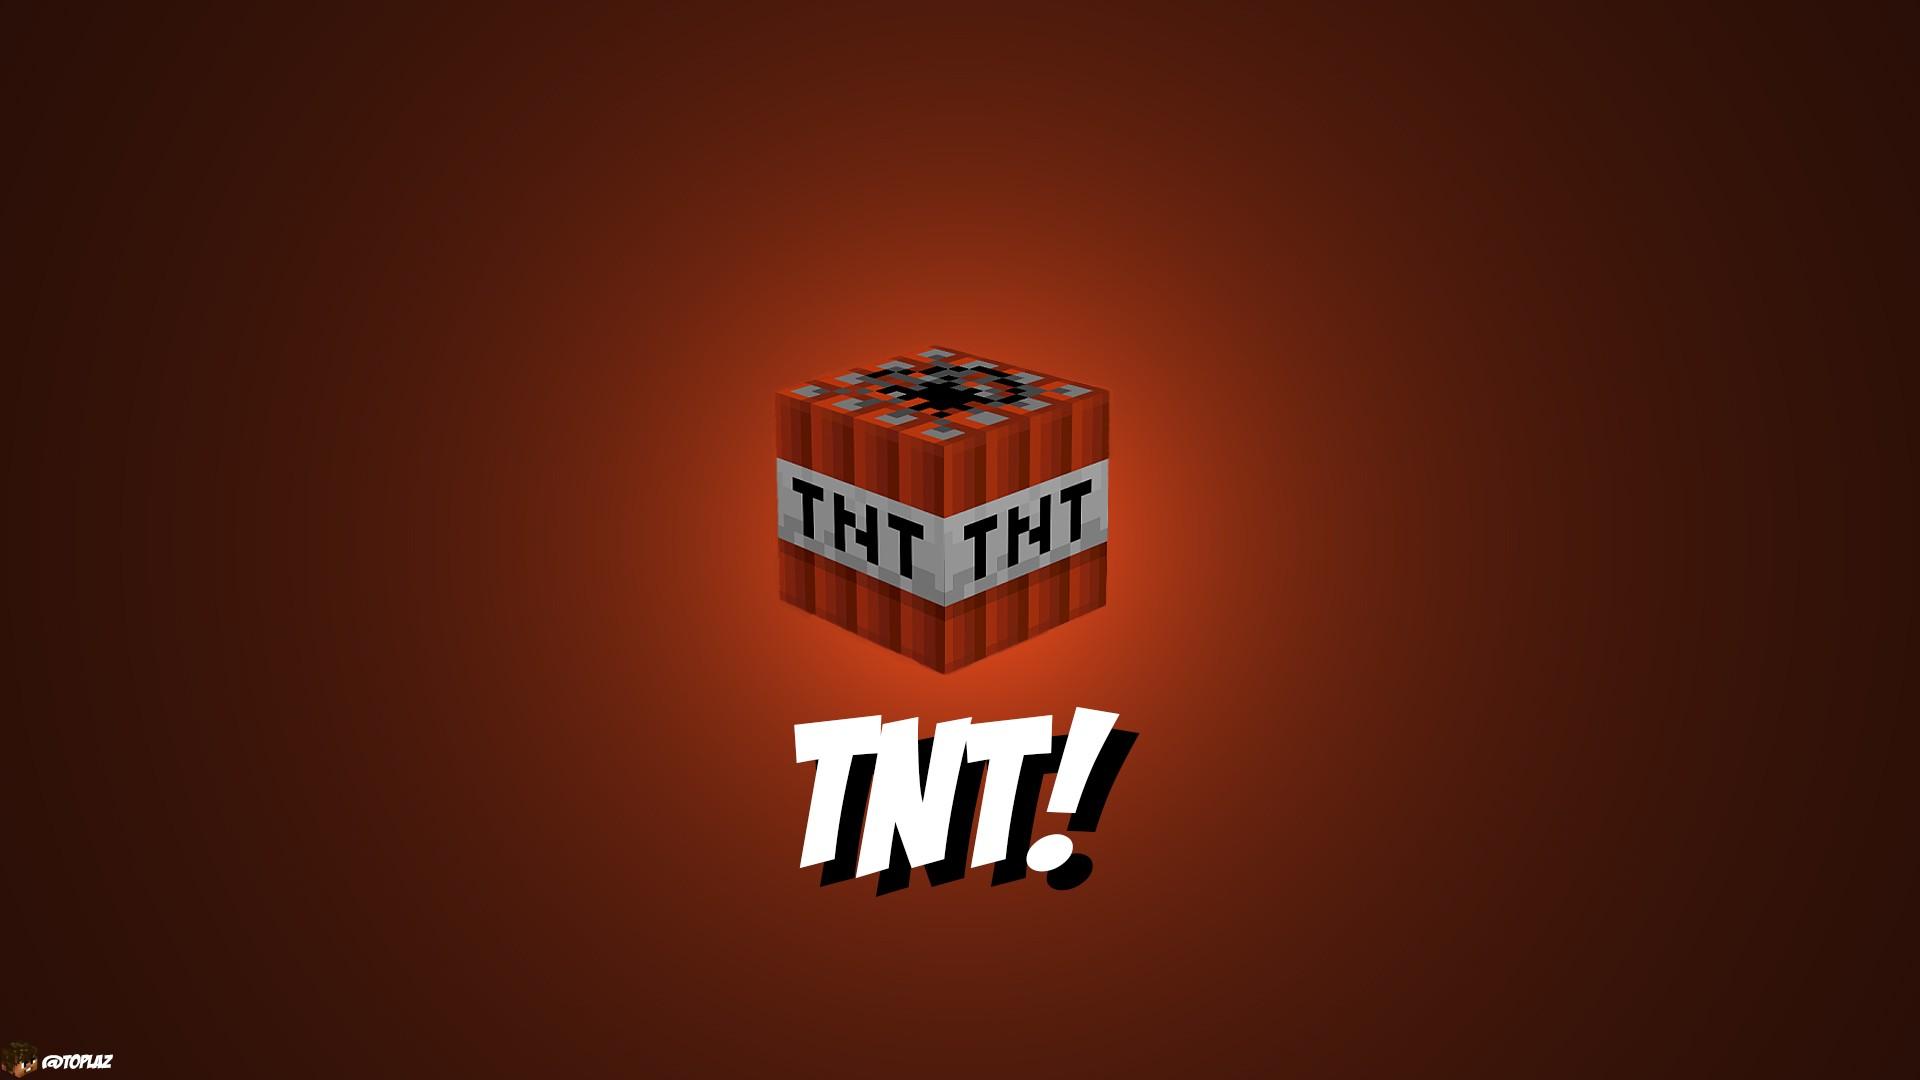 TNT Orange Color Minecraft 1920x1080